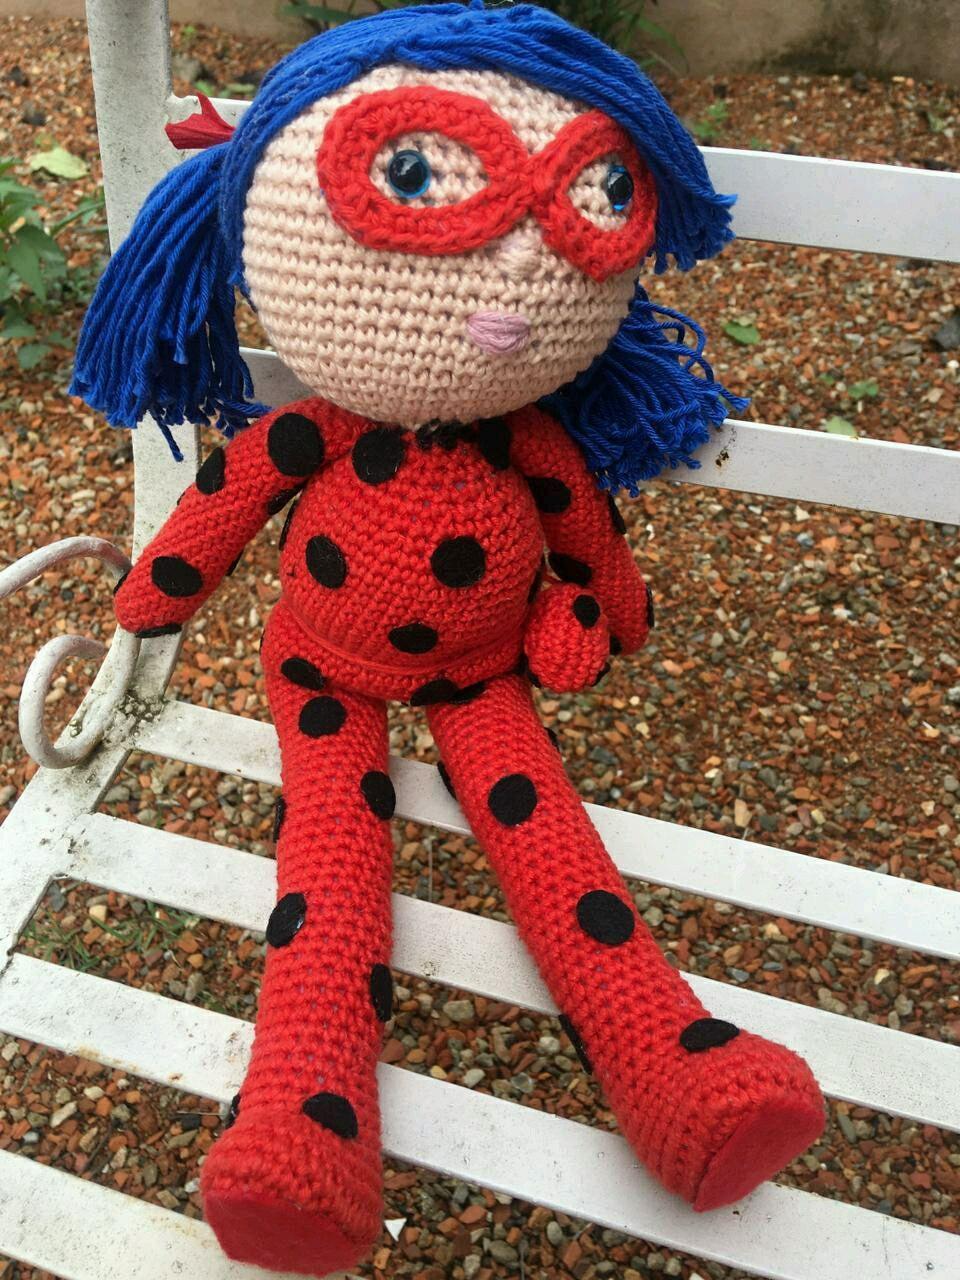 Amigurumi Pattern - Dotty the Ladybug - English Version (mit ... | 1280x960